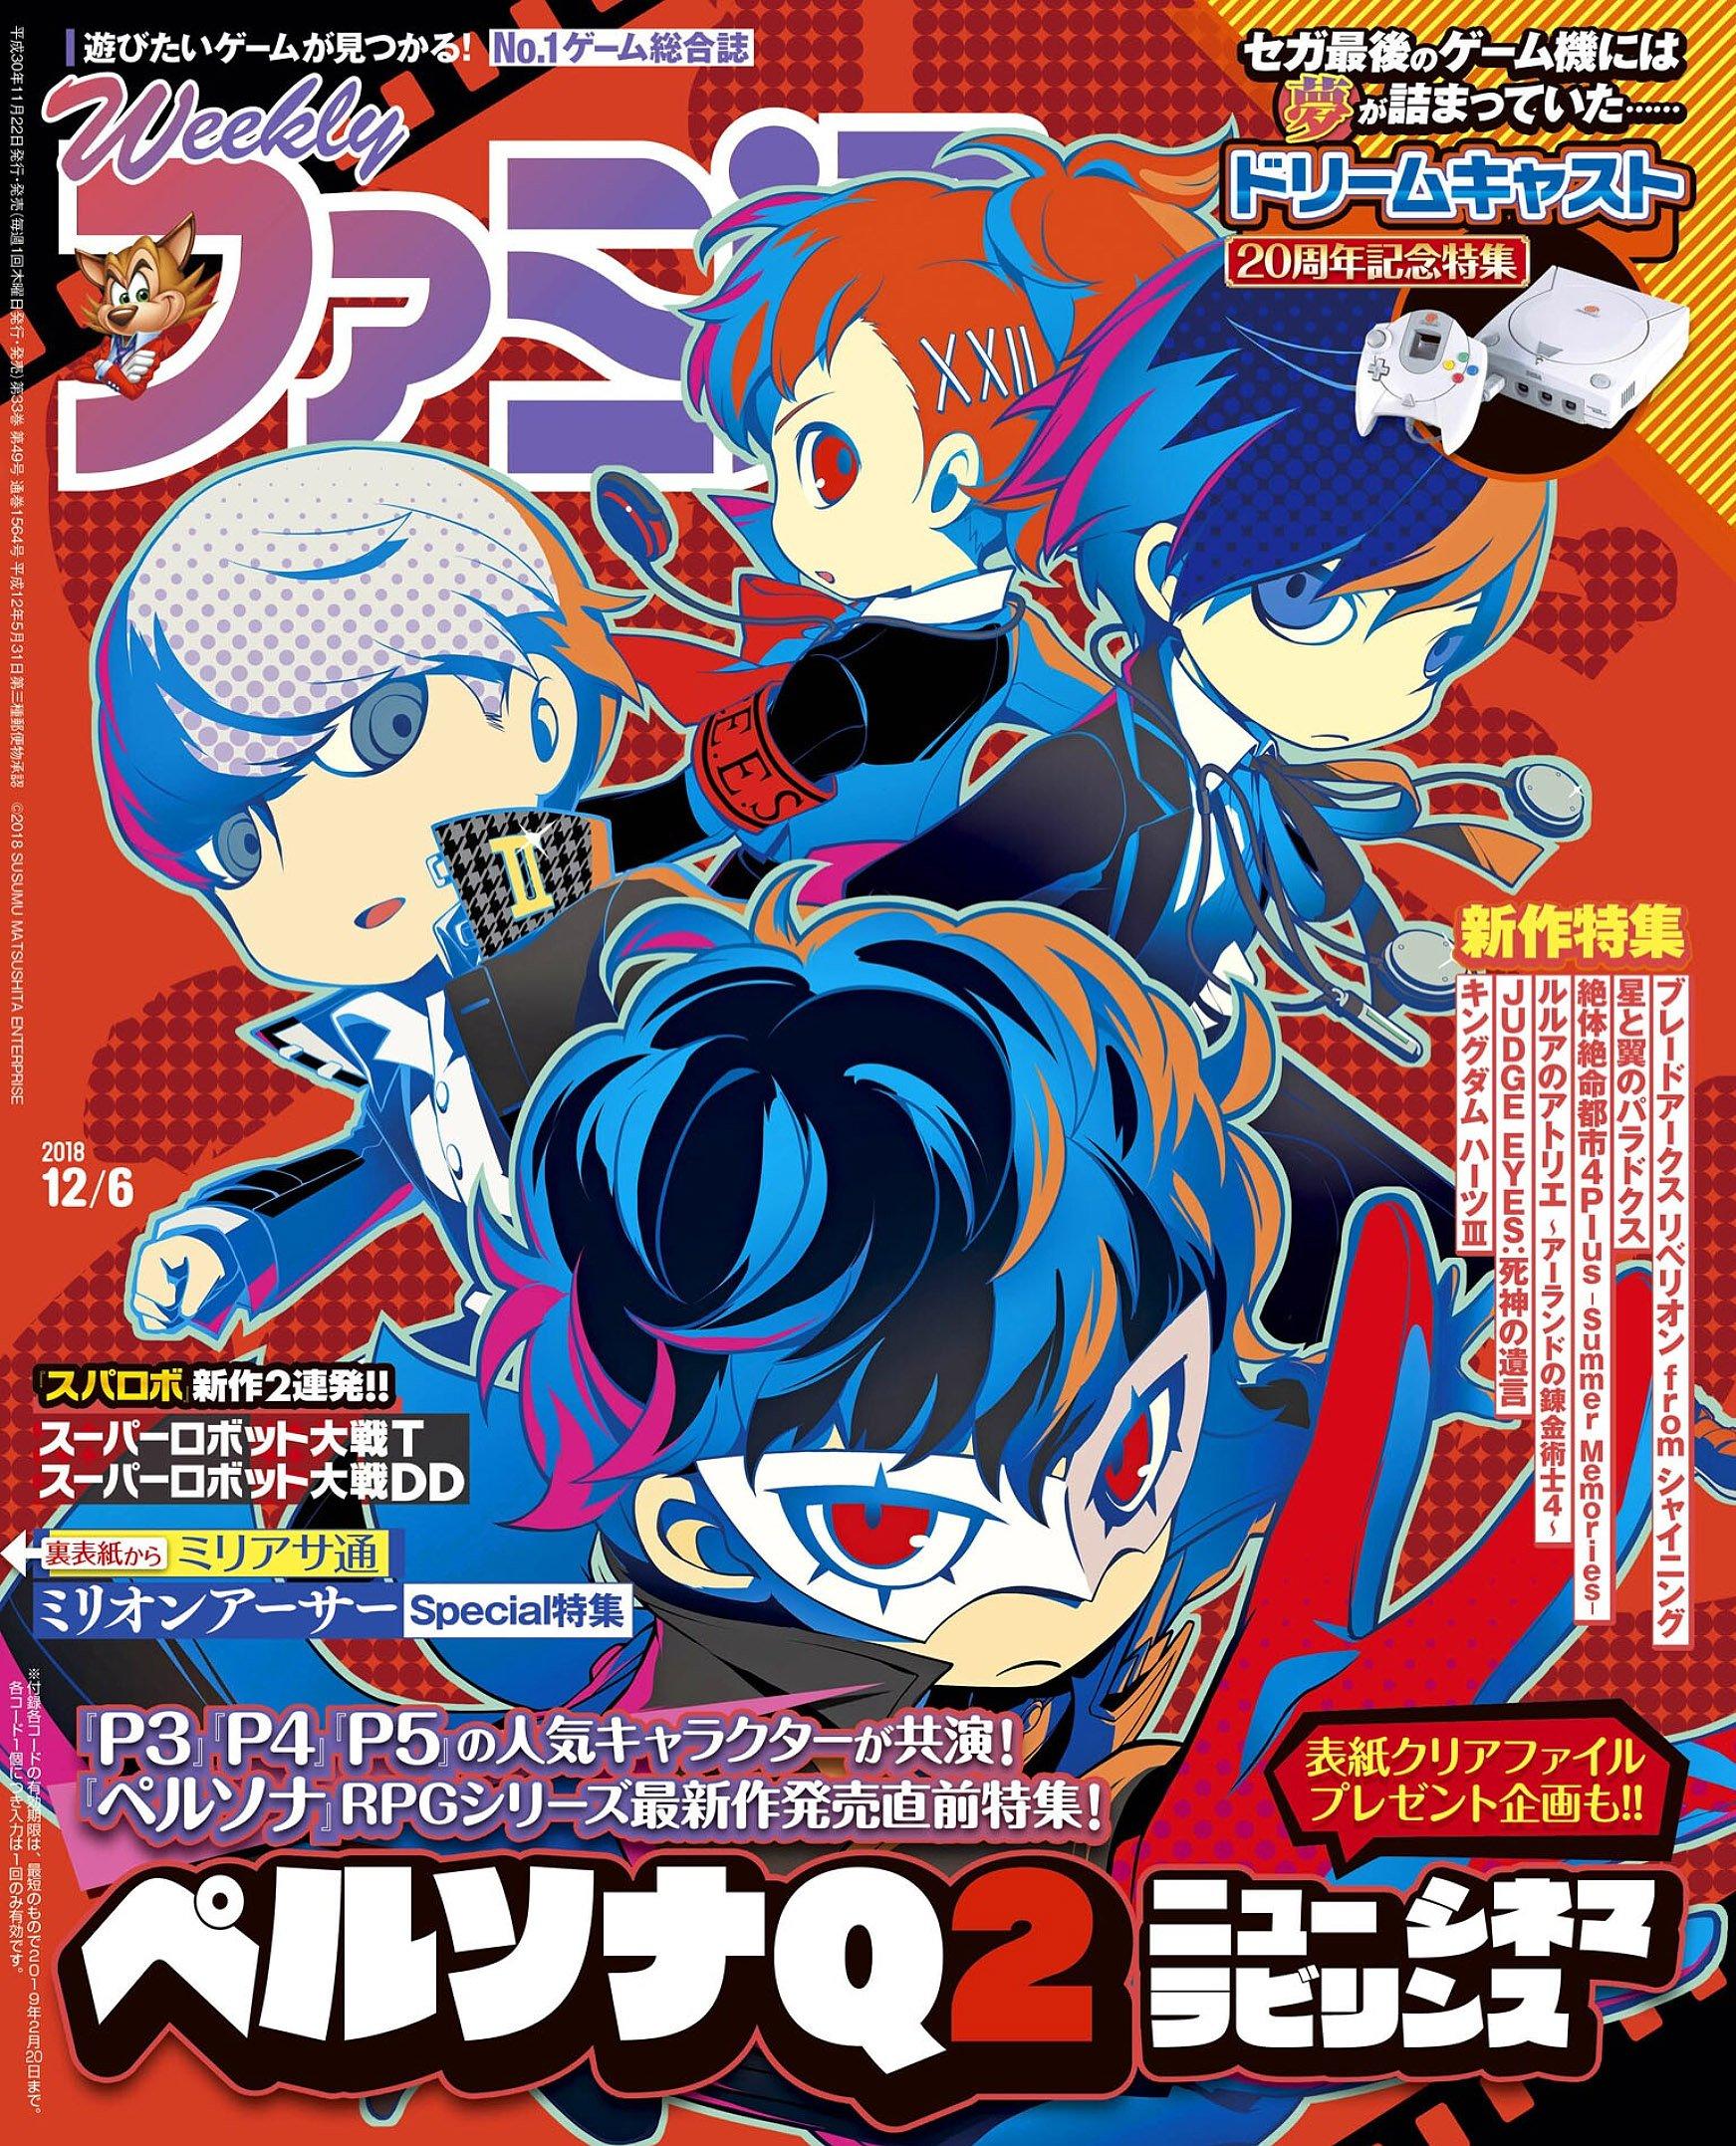 Famitsu 1564 (December 6, 2018)